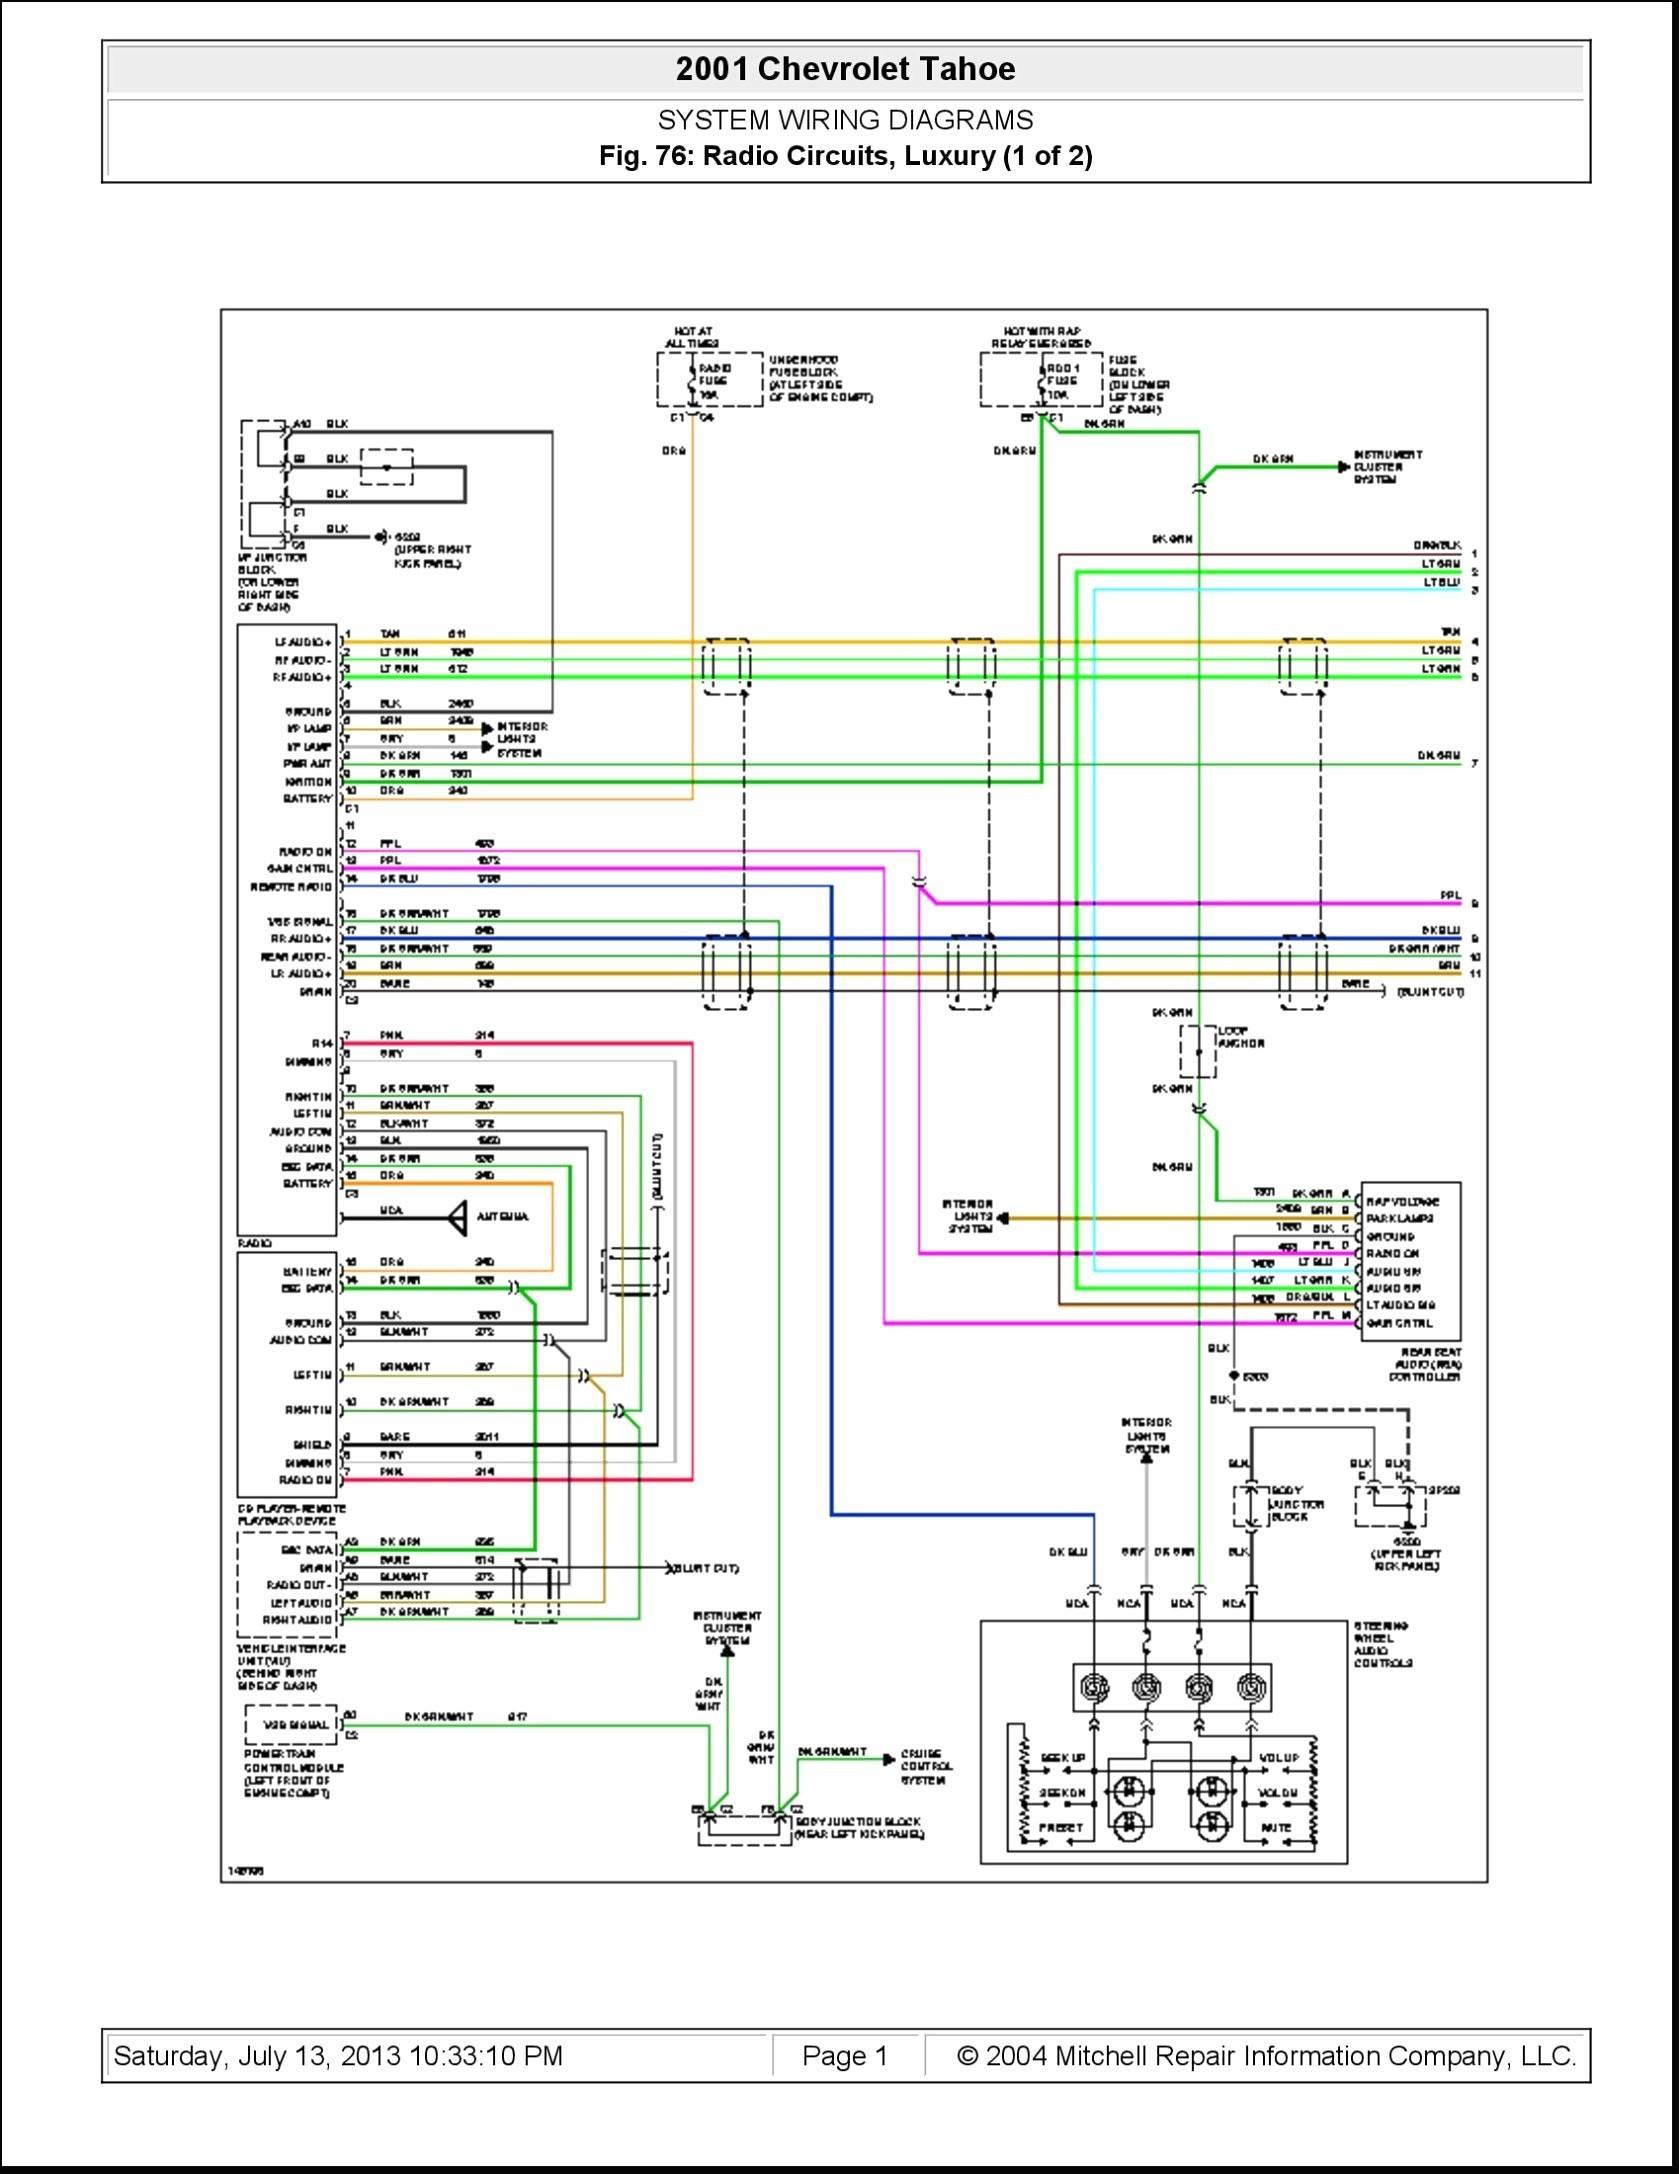 2001 Chevy Impala 3 8 Engine Diagram 2008 Chevy Impala Radio Wiring Diagram Simple 2004 Chevy Tahoe Radio